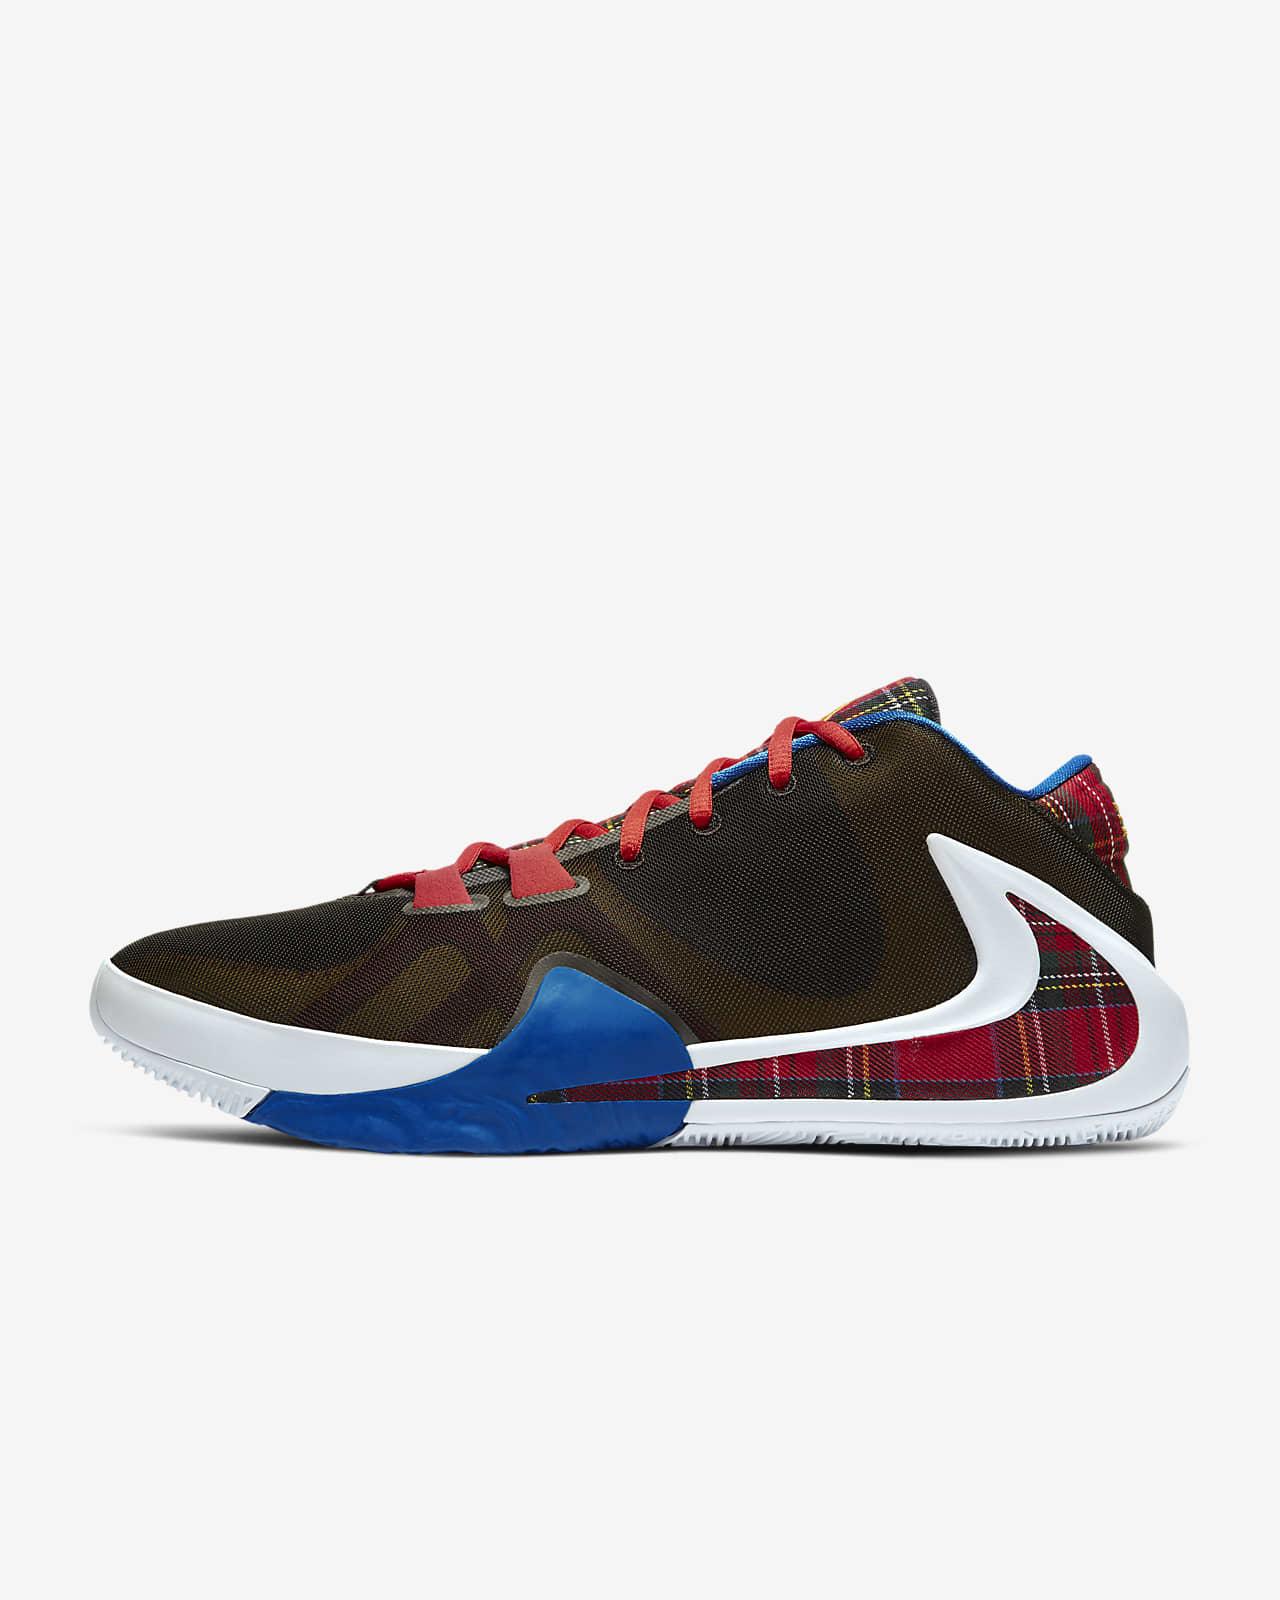 Zoom Freak 1 Multi Basketball Shoe. Nike FI